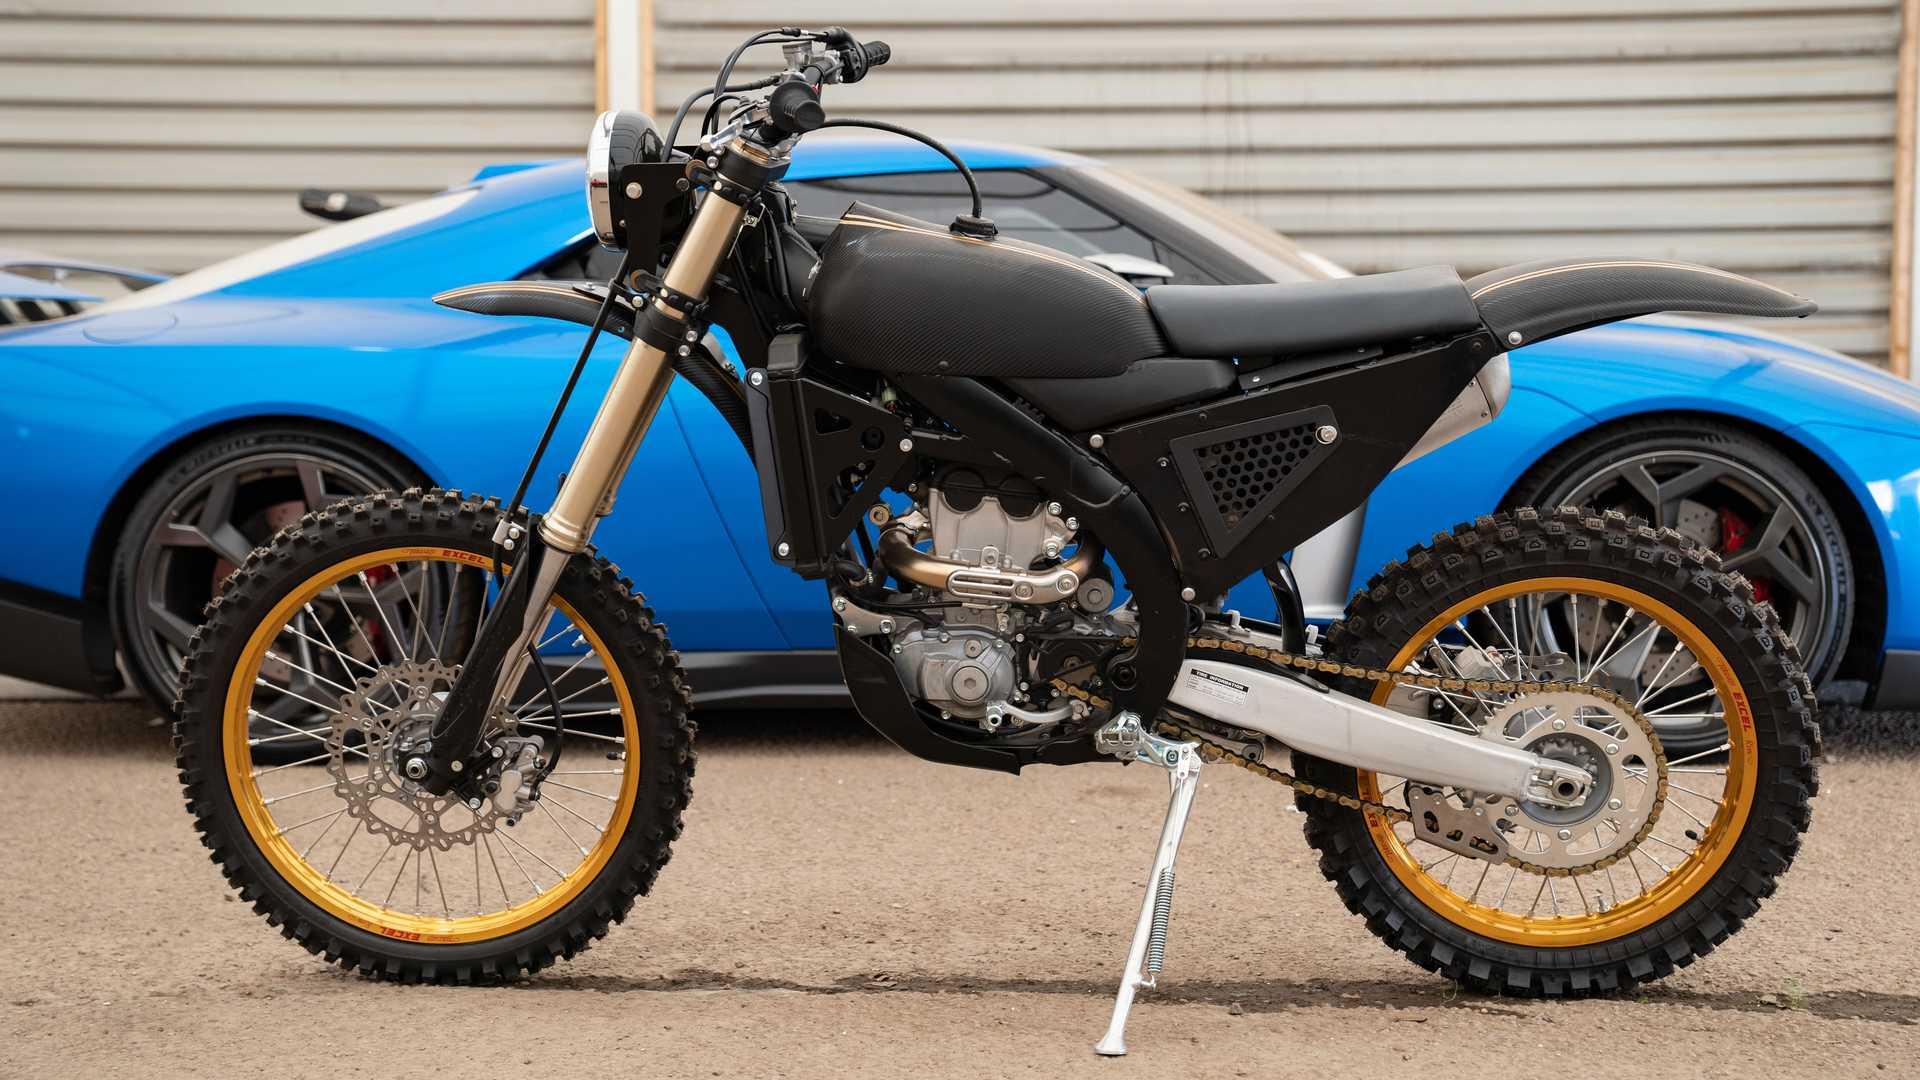 letty-s-yamaha-yz250f-motorcycle